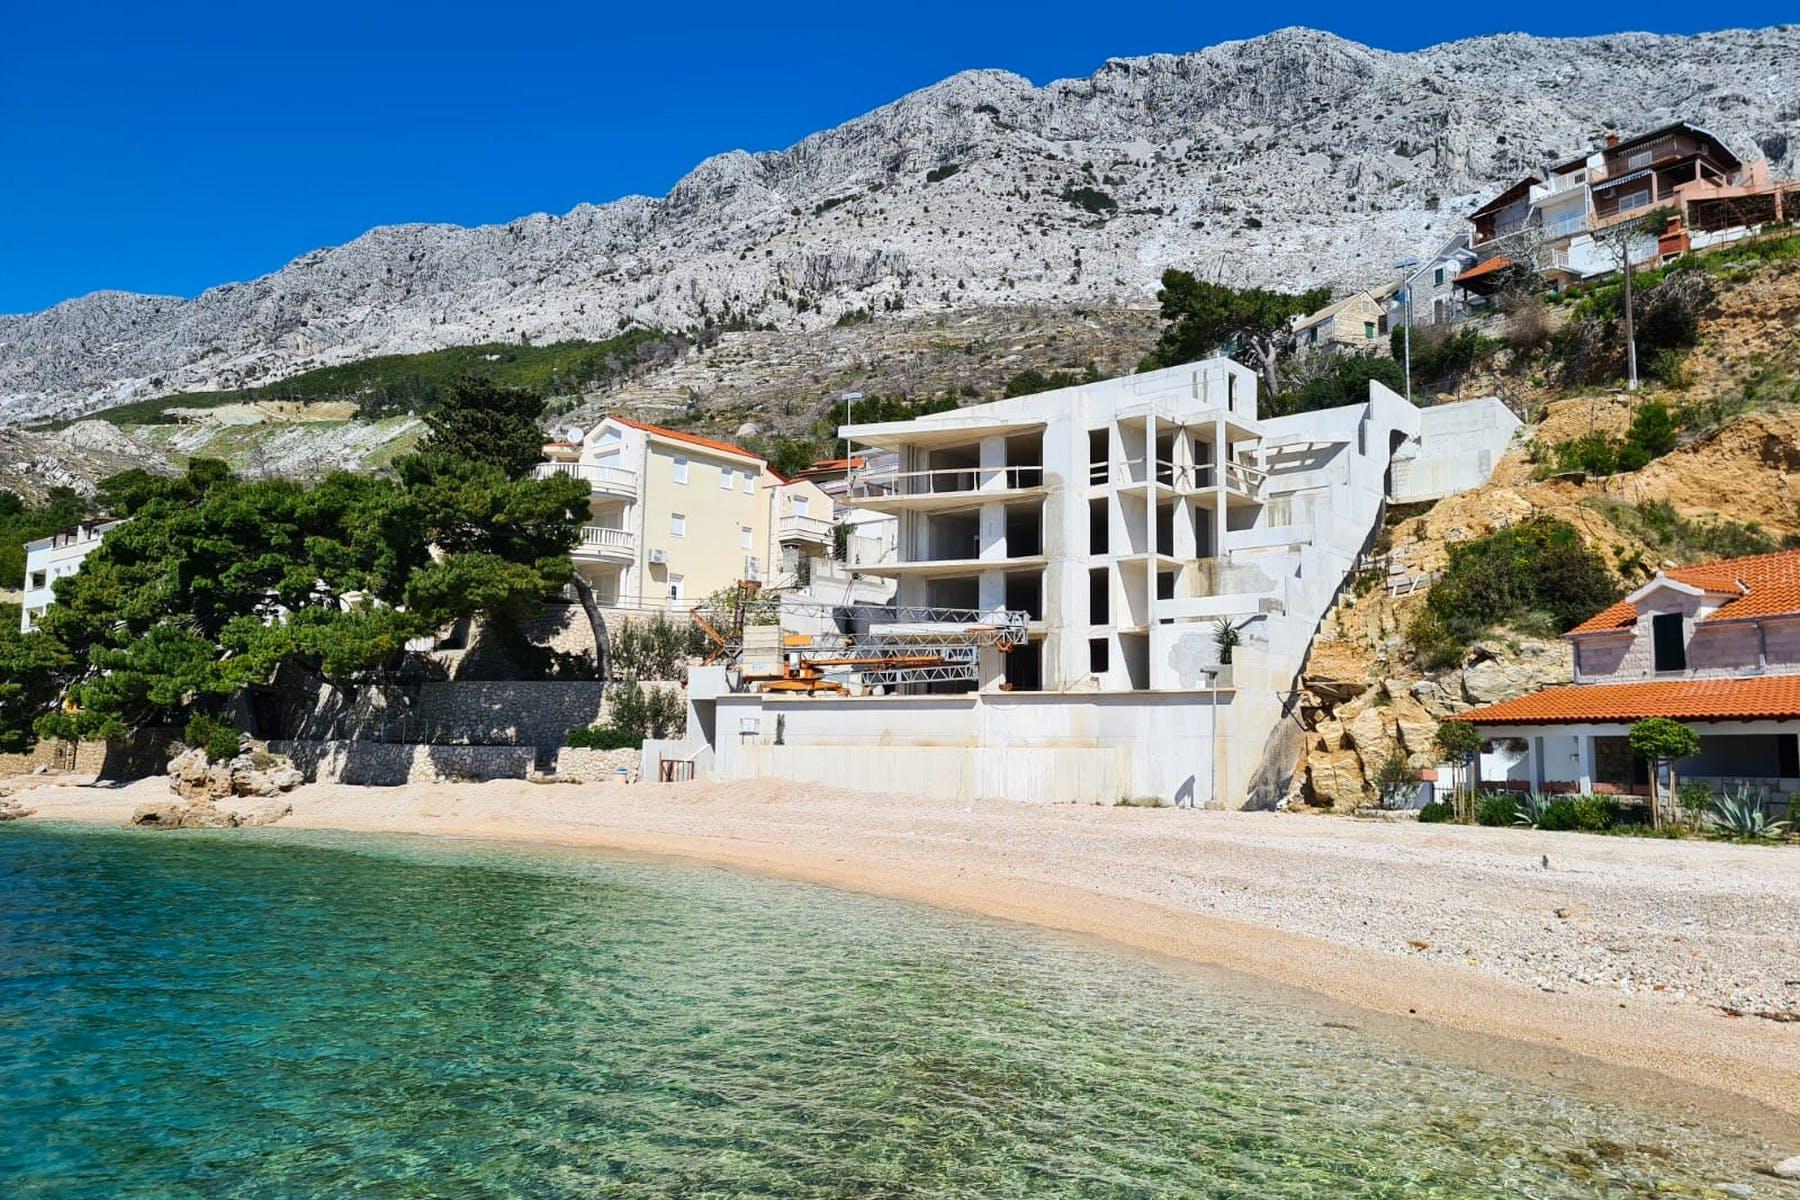 Seafront villa under construction for sale